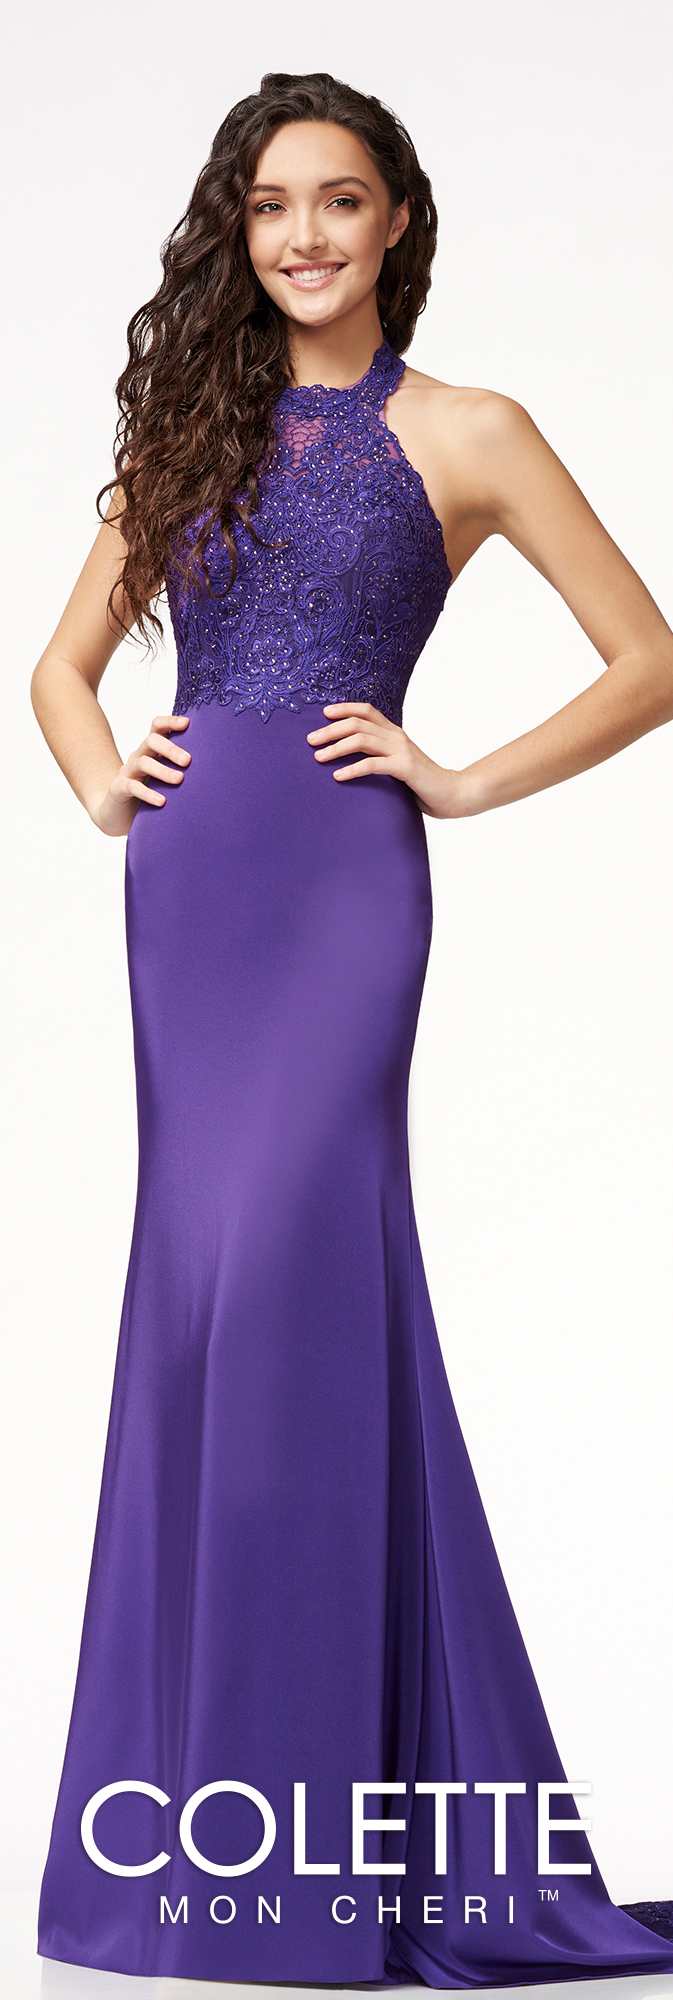 Jersey Halter Formal Dress - Colette for Mon Cheri - CL18224